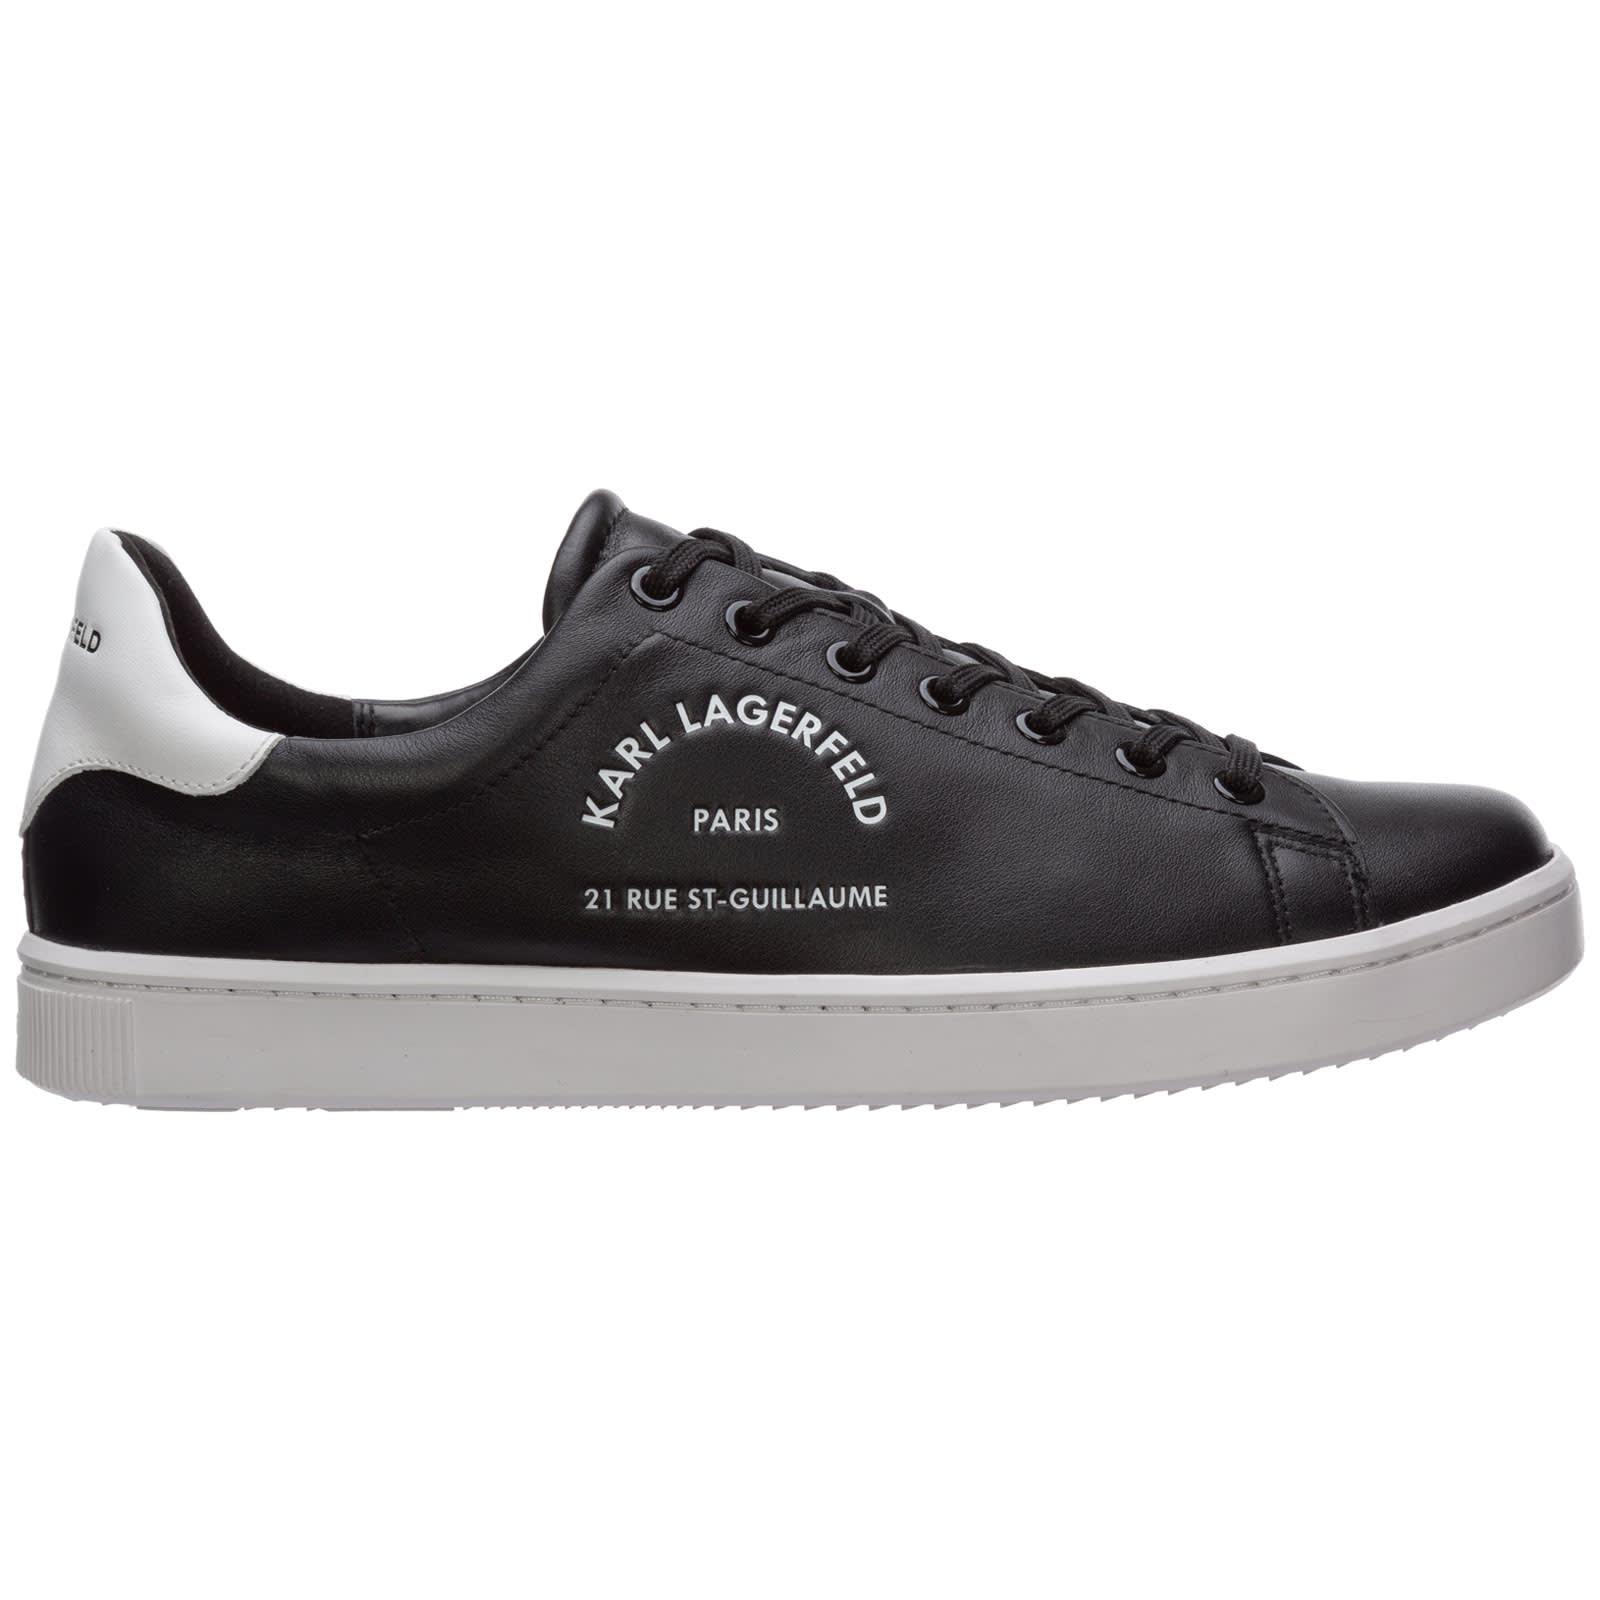 Karl Lagerfeld Rue St Guillaume Sneakers